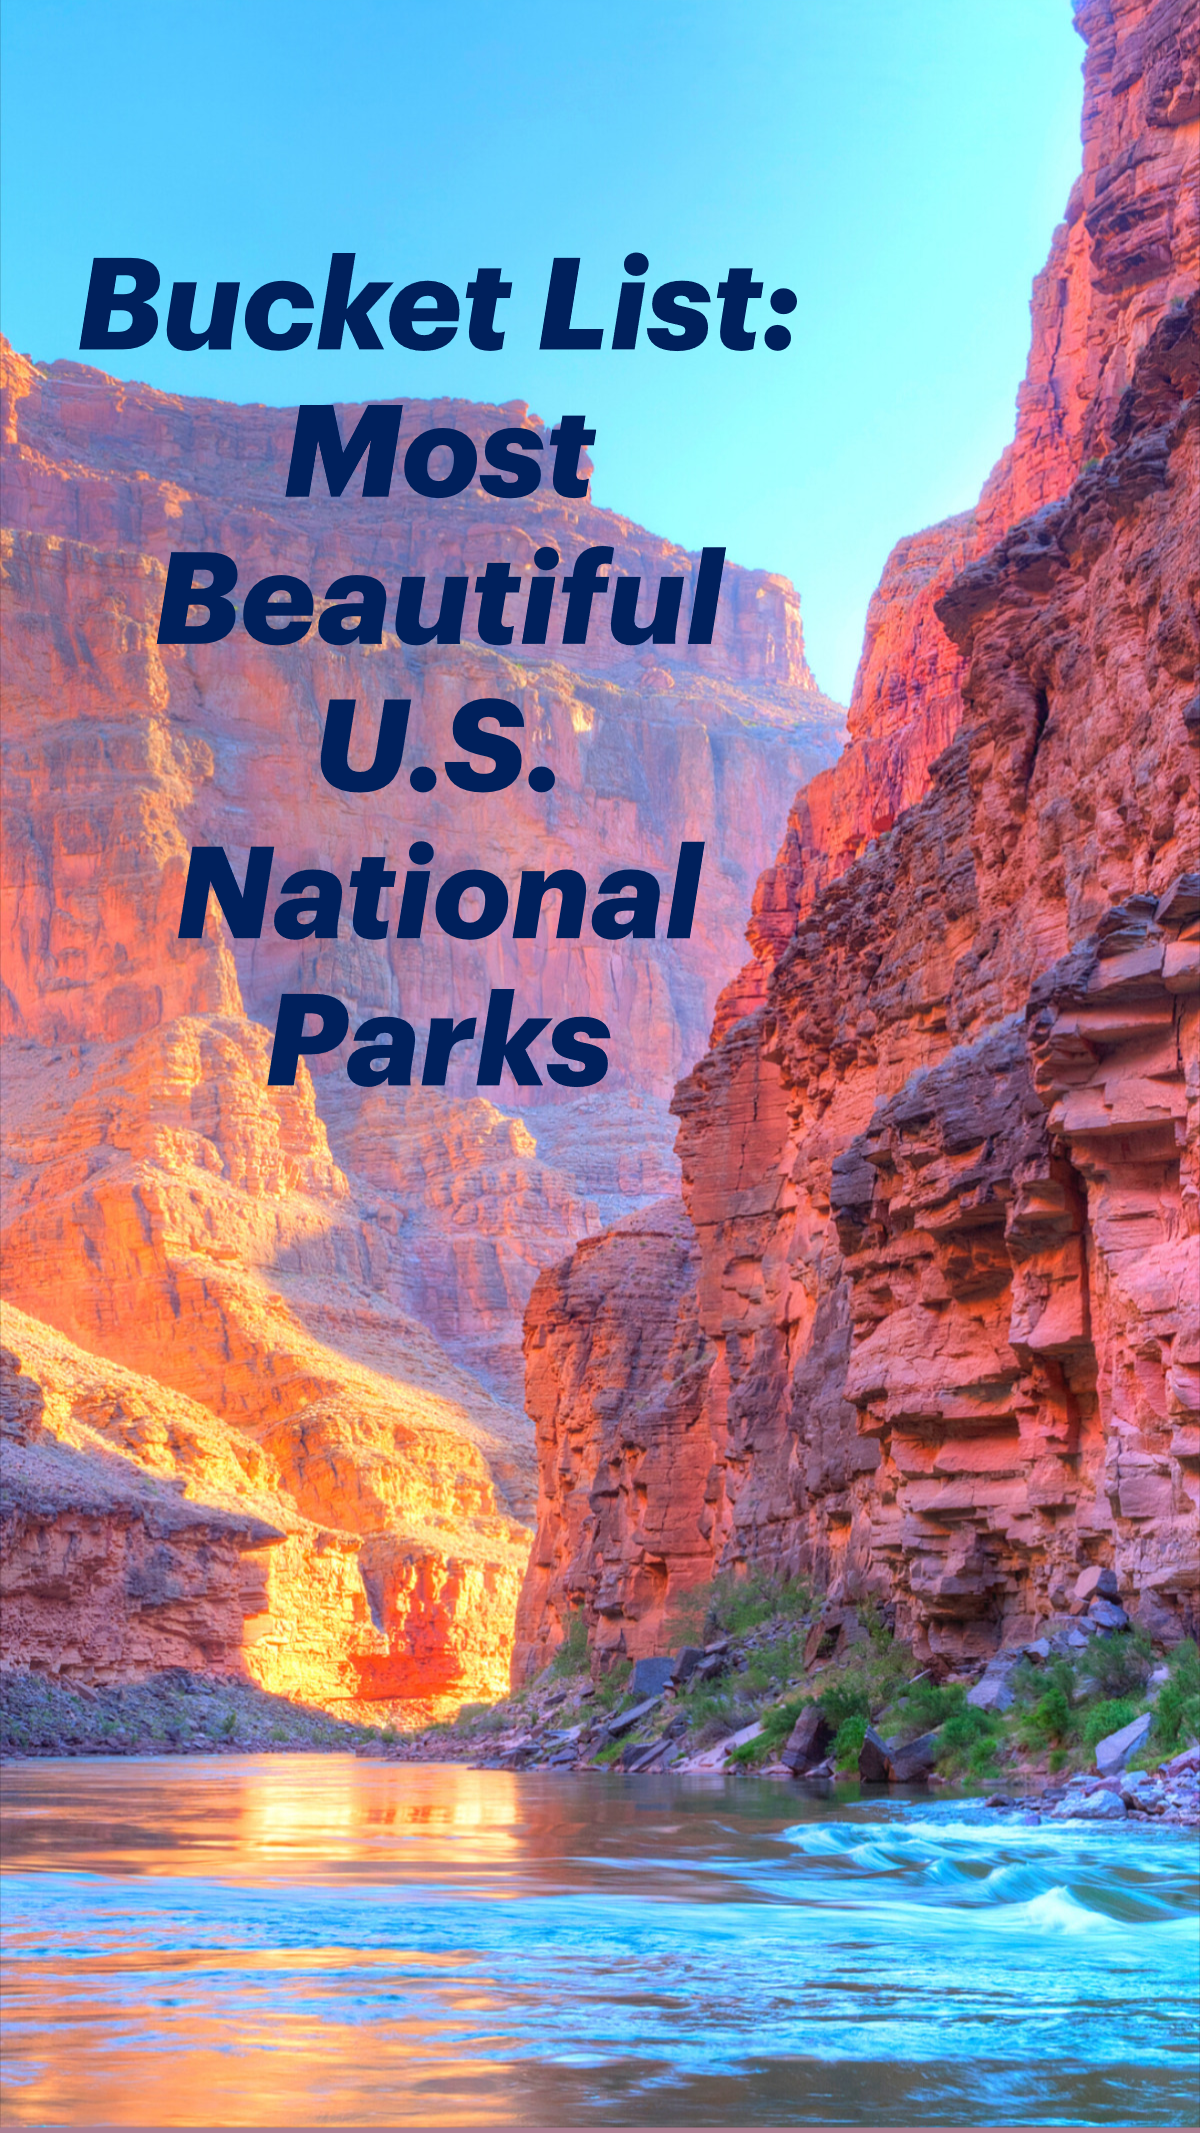 Bucket List: Most Beautiful U.S. National Parks